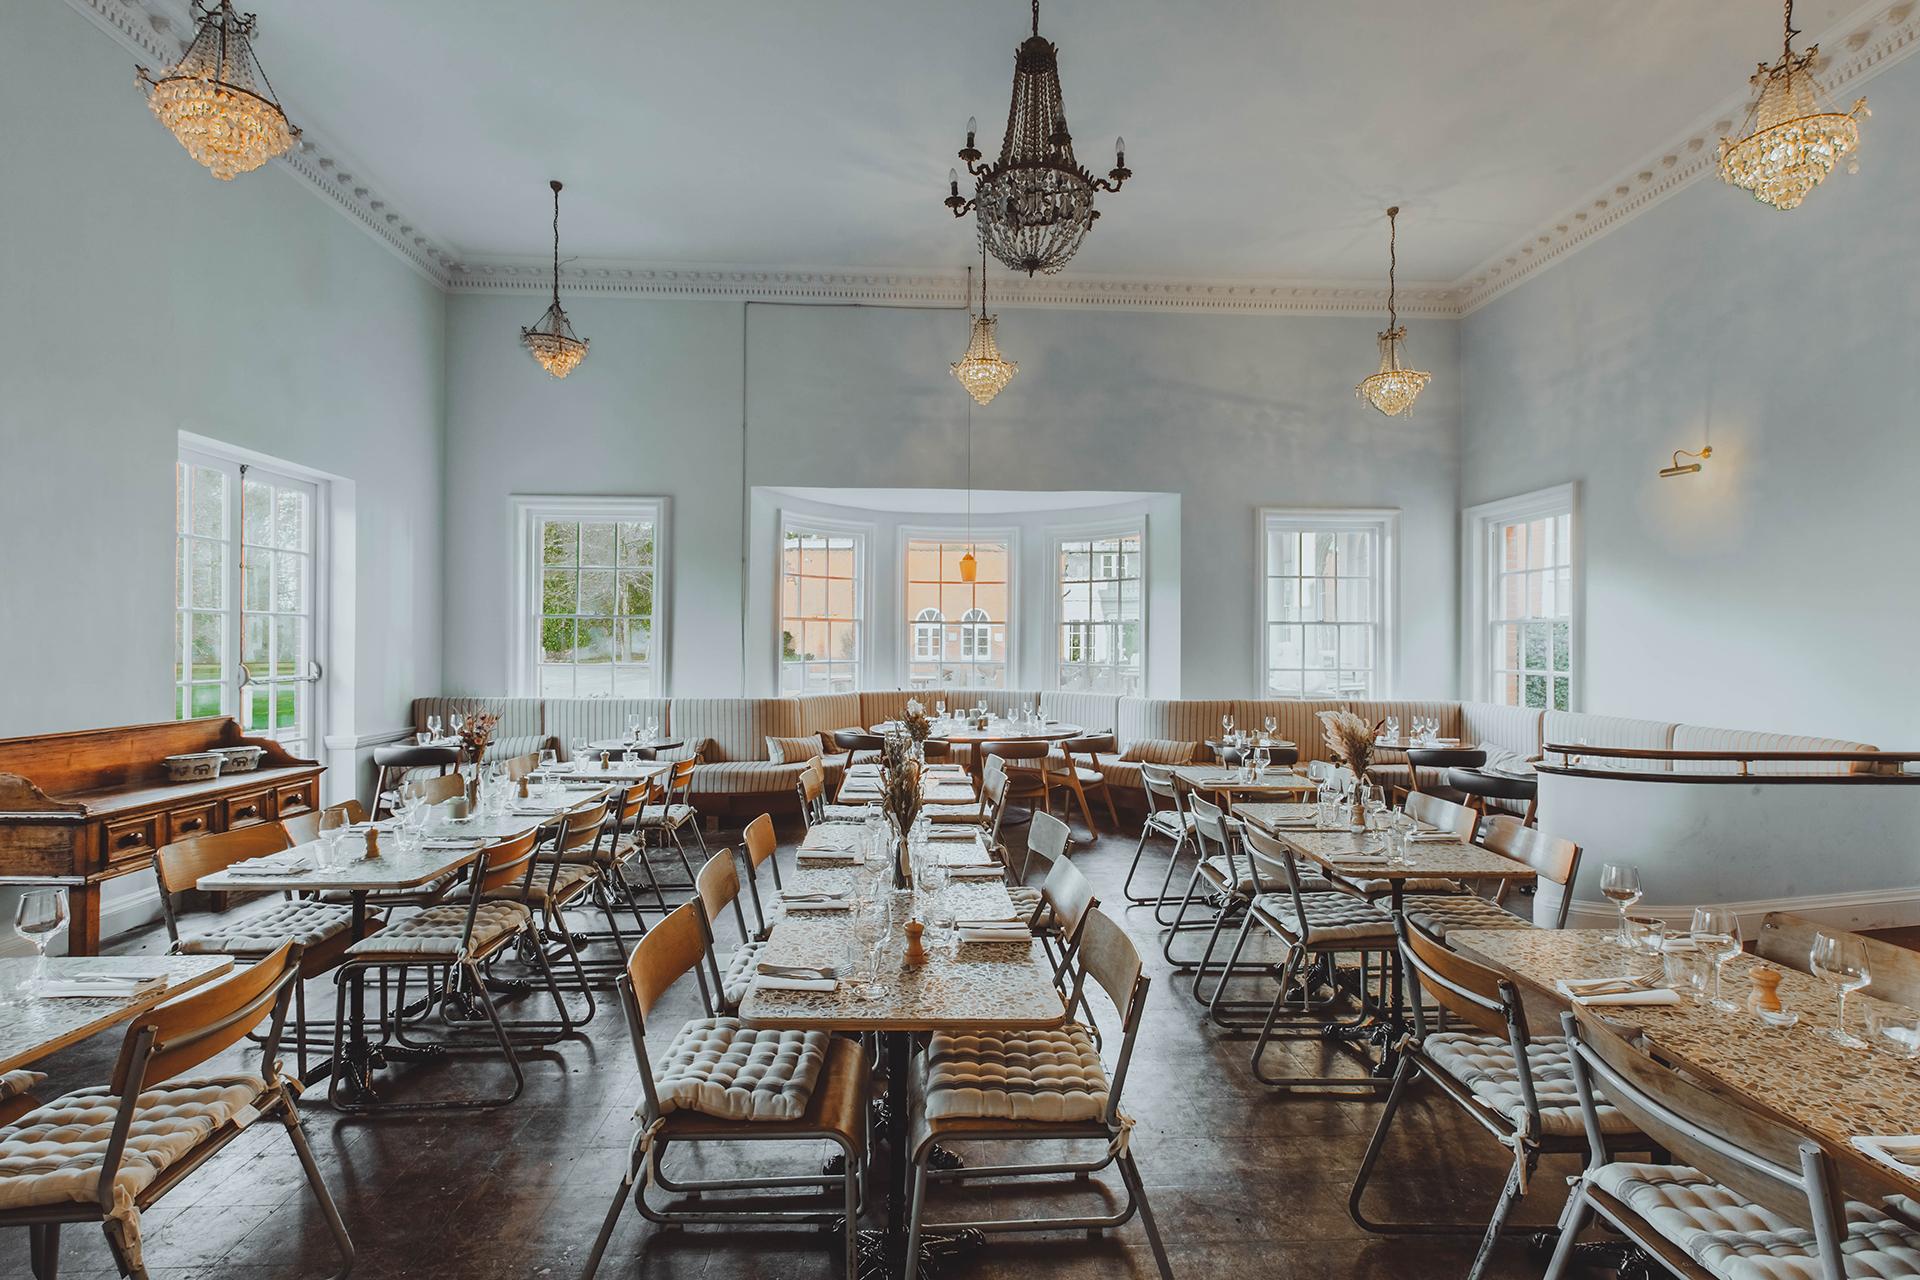 """Valeries"" All-Day Restaurant. Photo by Adam Firman."